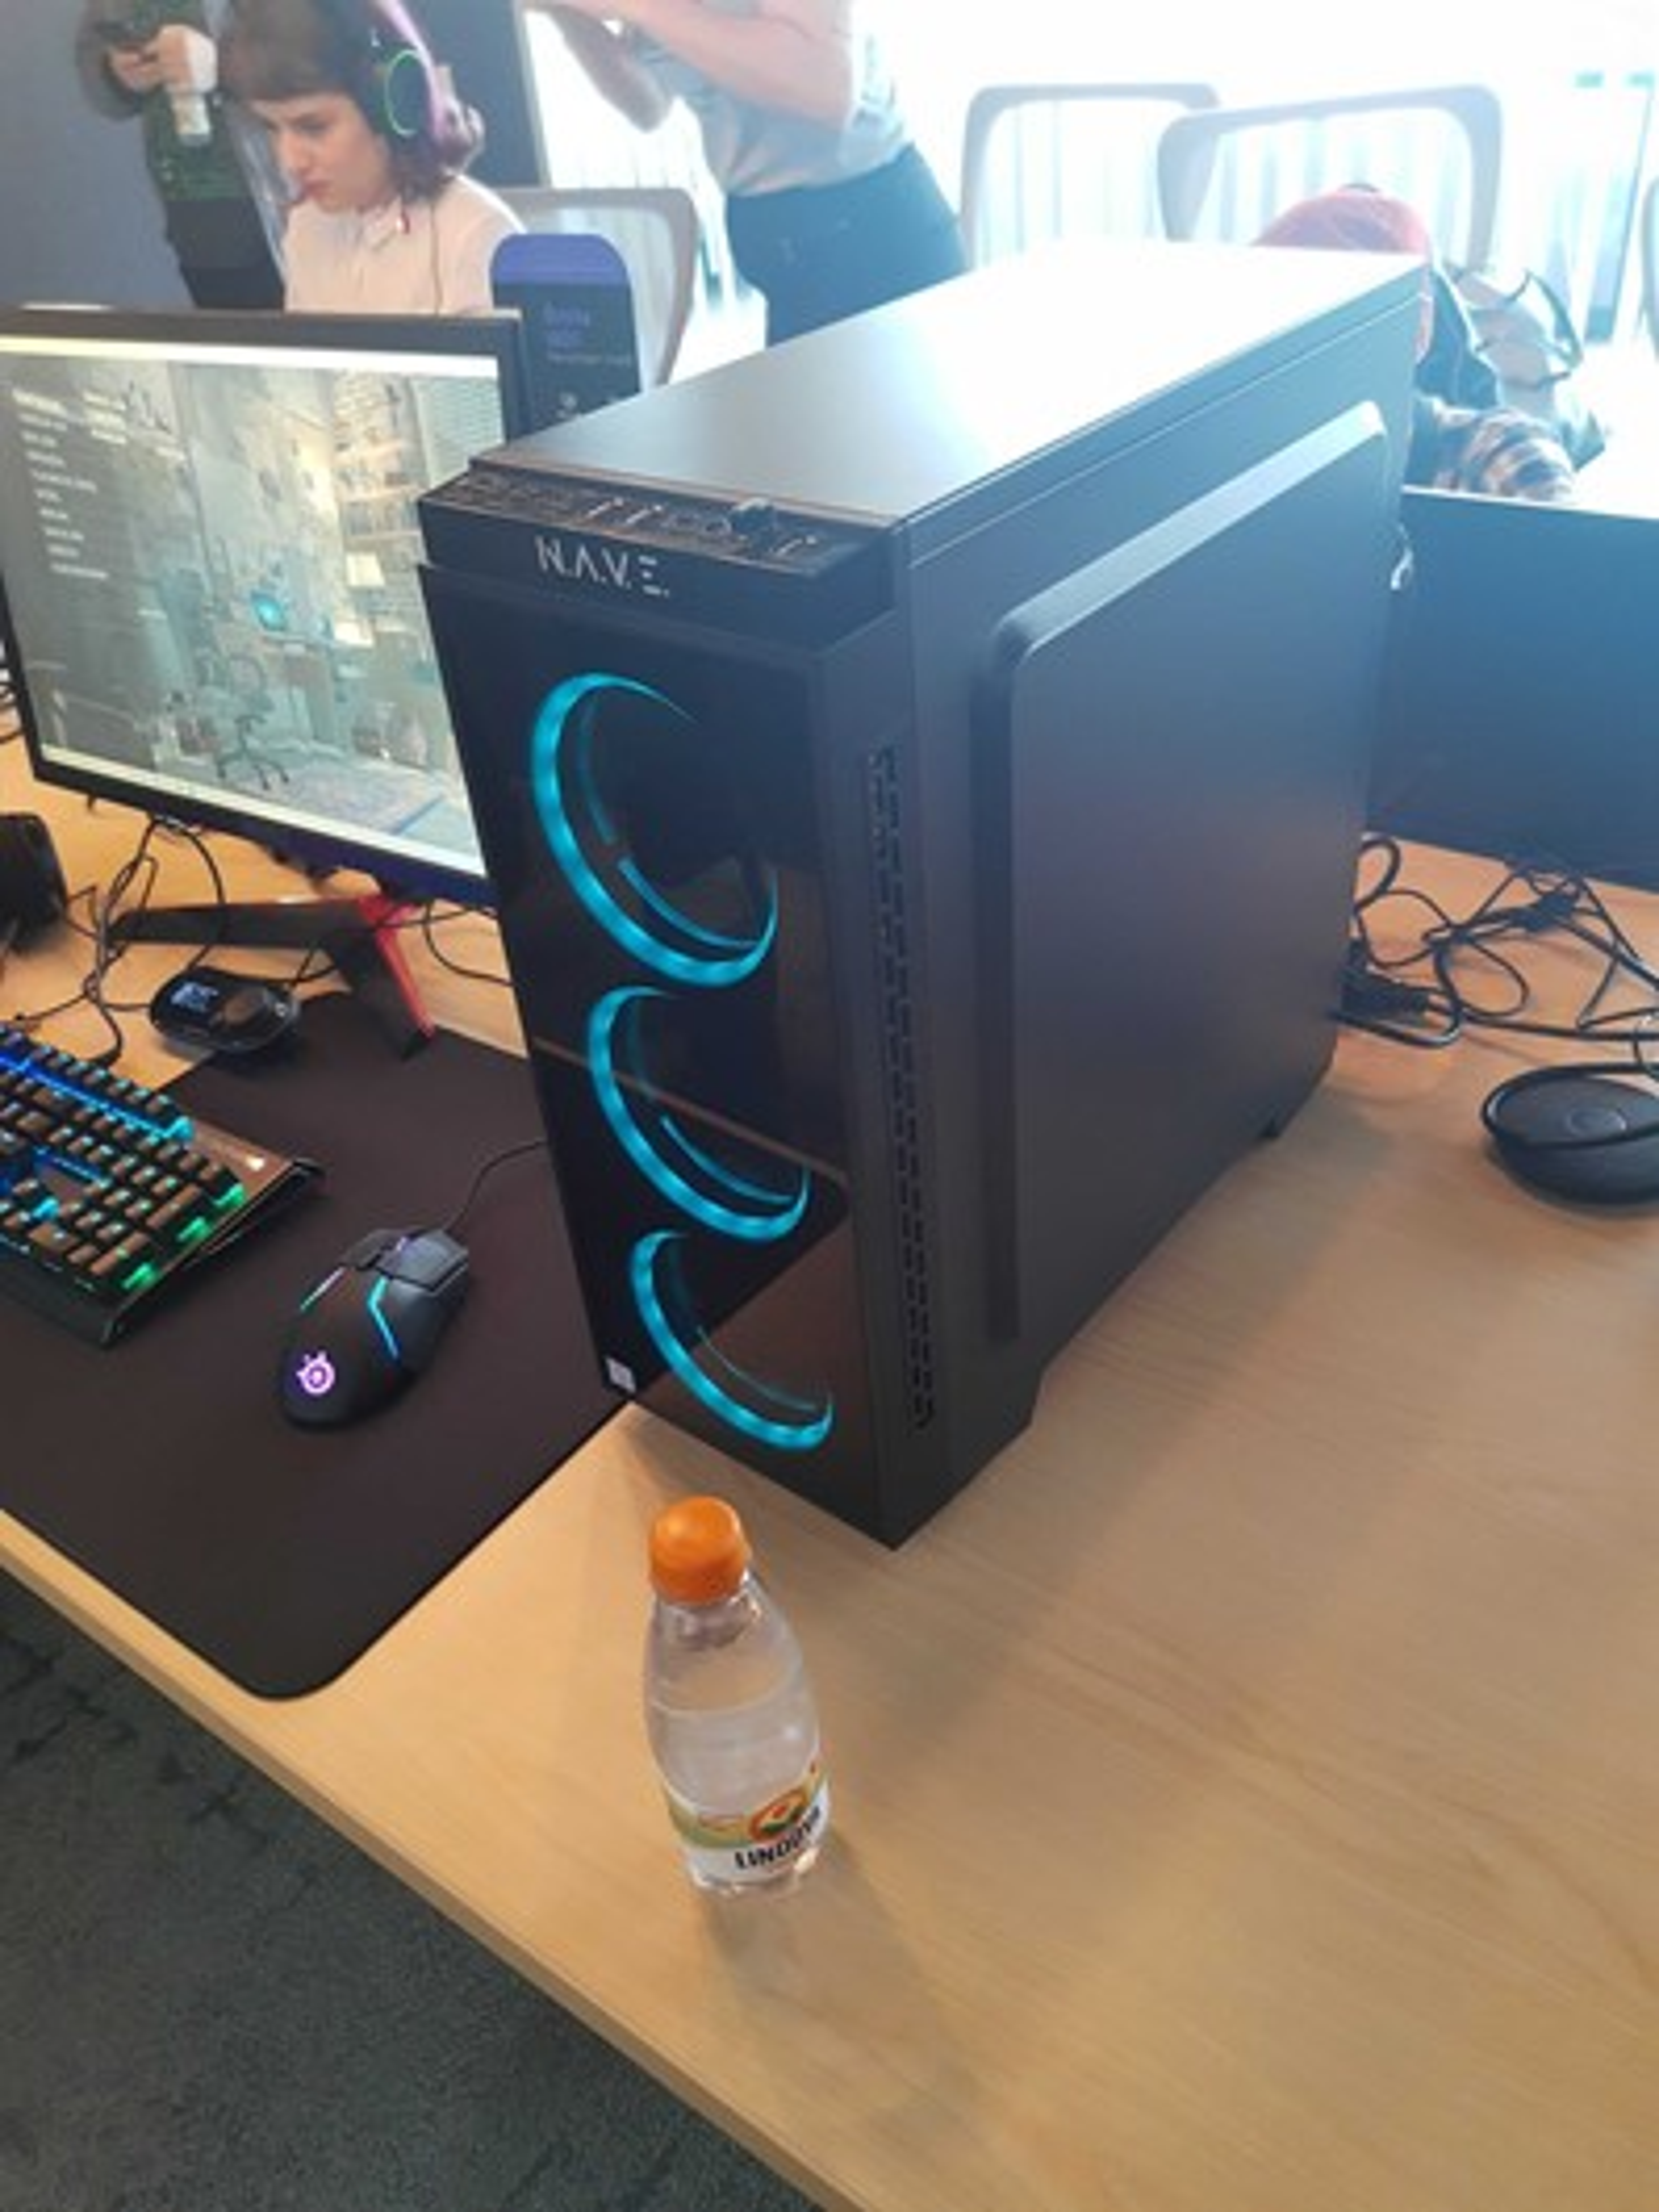 Daten lança linha N.A.V.E. de PCs e notebooks gamers